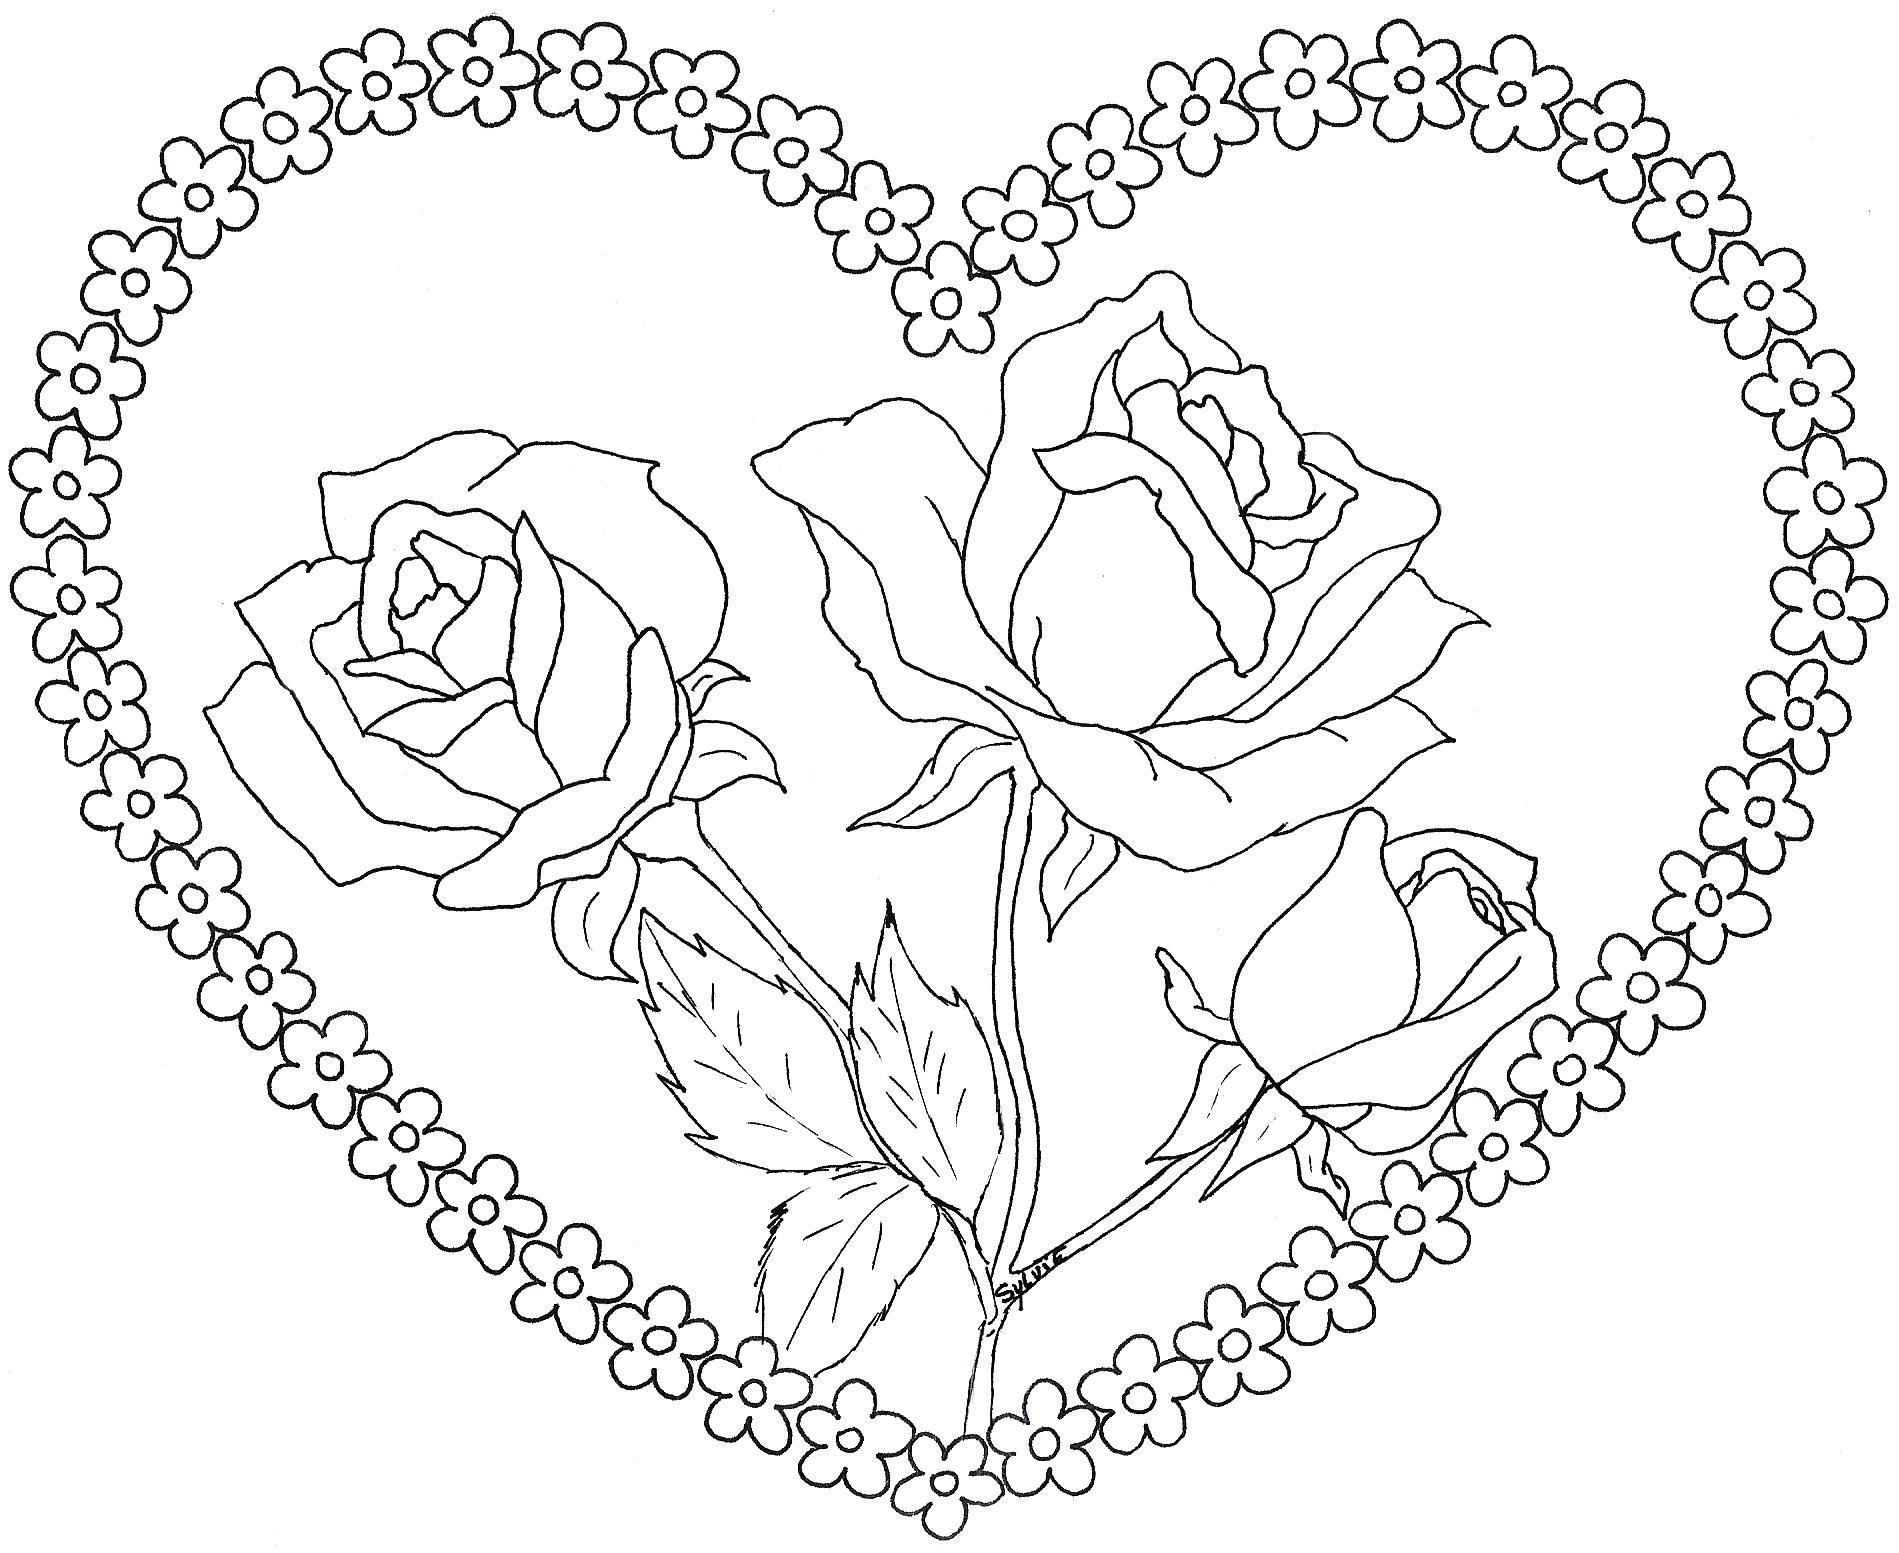 63 dessins de coloriage rose et coeur imprimer sur page 1. Black Bedroom Furniture Sets. Home Design Ideas